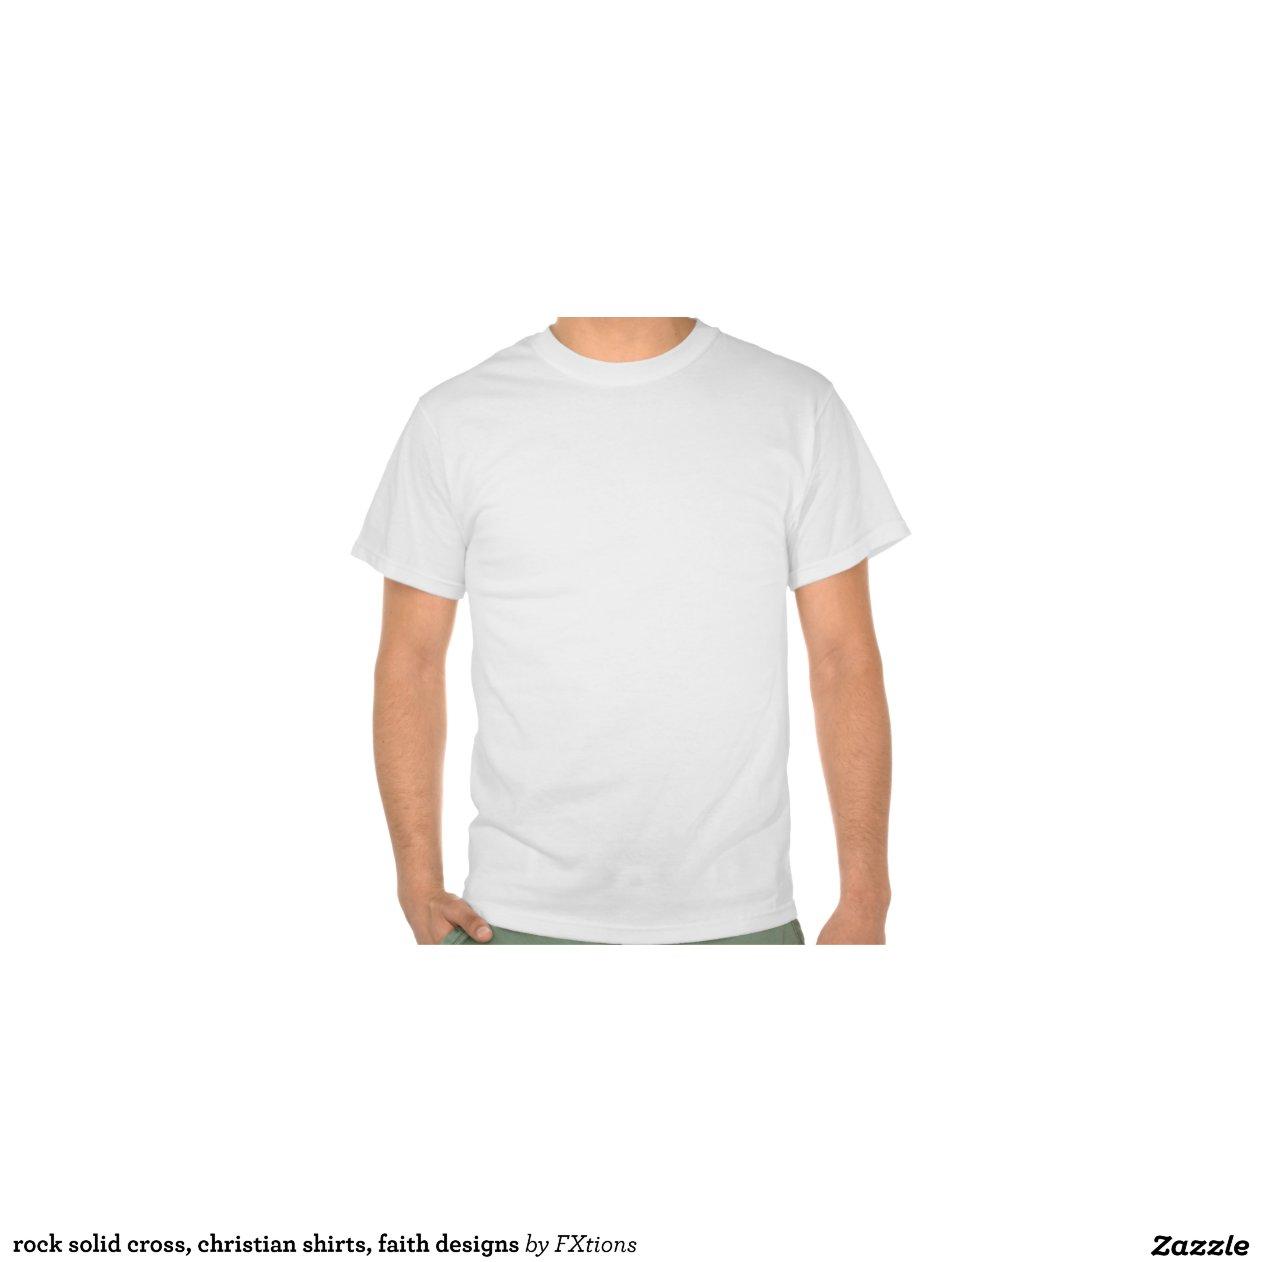 Rock solid cross christian shirts faith designs t shirt Design t shirt australia